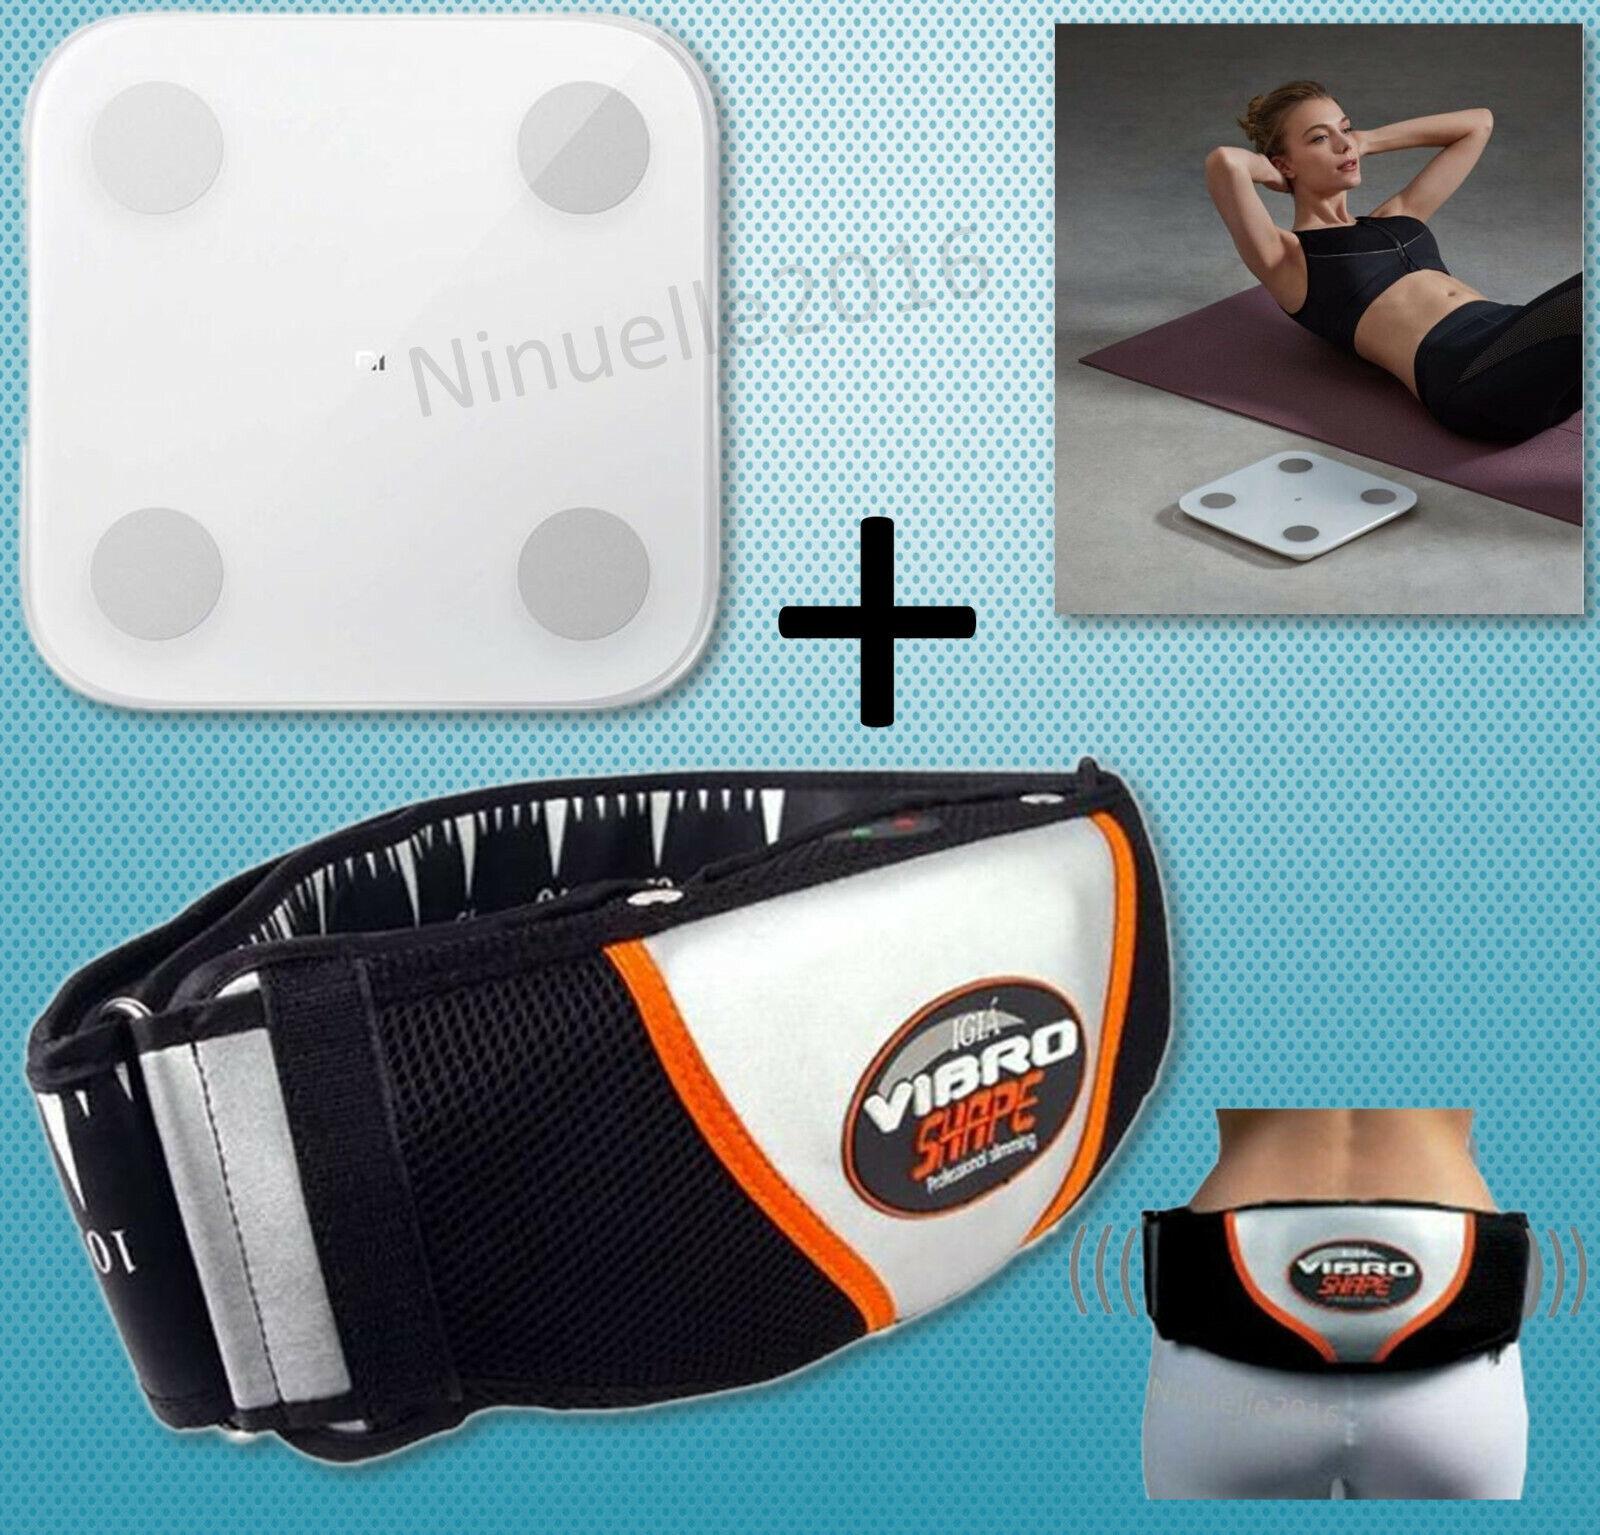 Massagegürtel Vibro Shape Bauchmuskeltrainer + Körperanalysewaage Xiaomi Mi, BMI